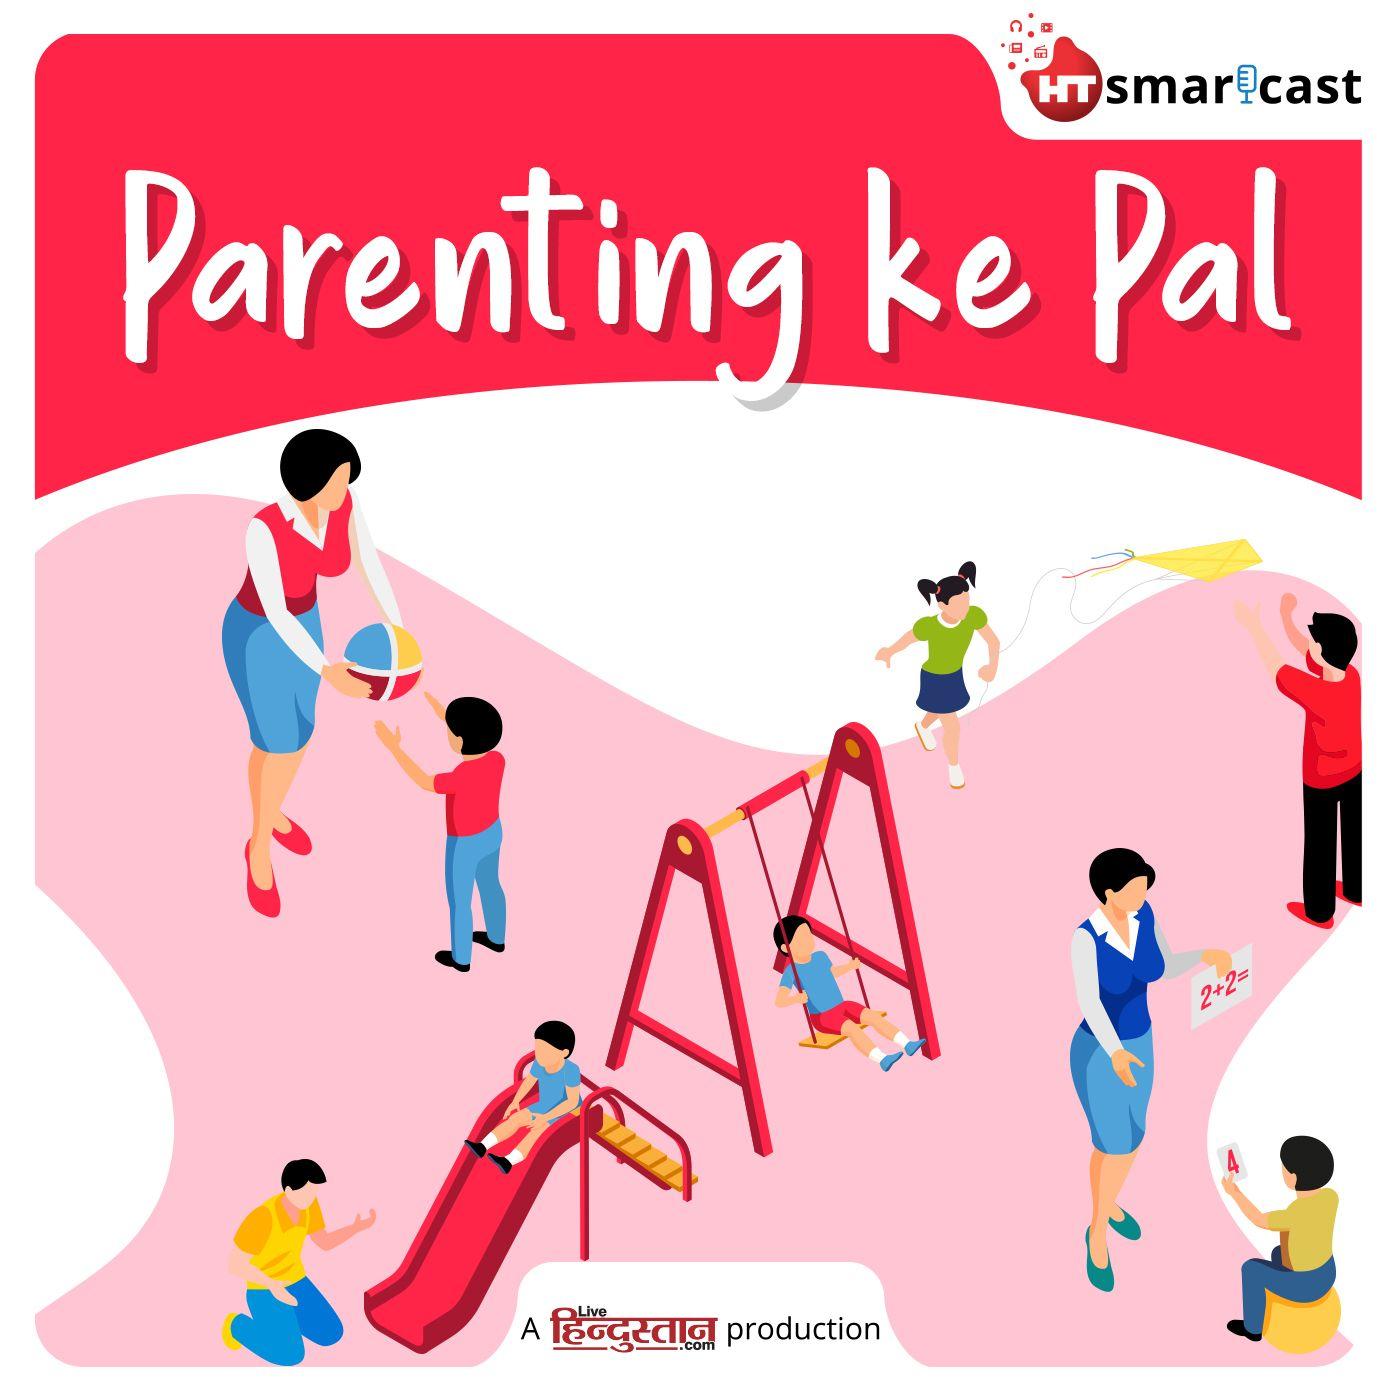 त्यौहारों में छिपी हुई पाजिटिविटी | Optimism | Festive season | Parenting Podcast: Listen to the Best त्यौहारों में छिपी हुई पाजिटिविटी | Optimism | Festive season | Parenting Audio and Shows Online | HTSmartcast